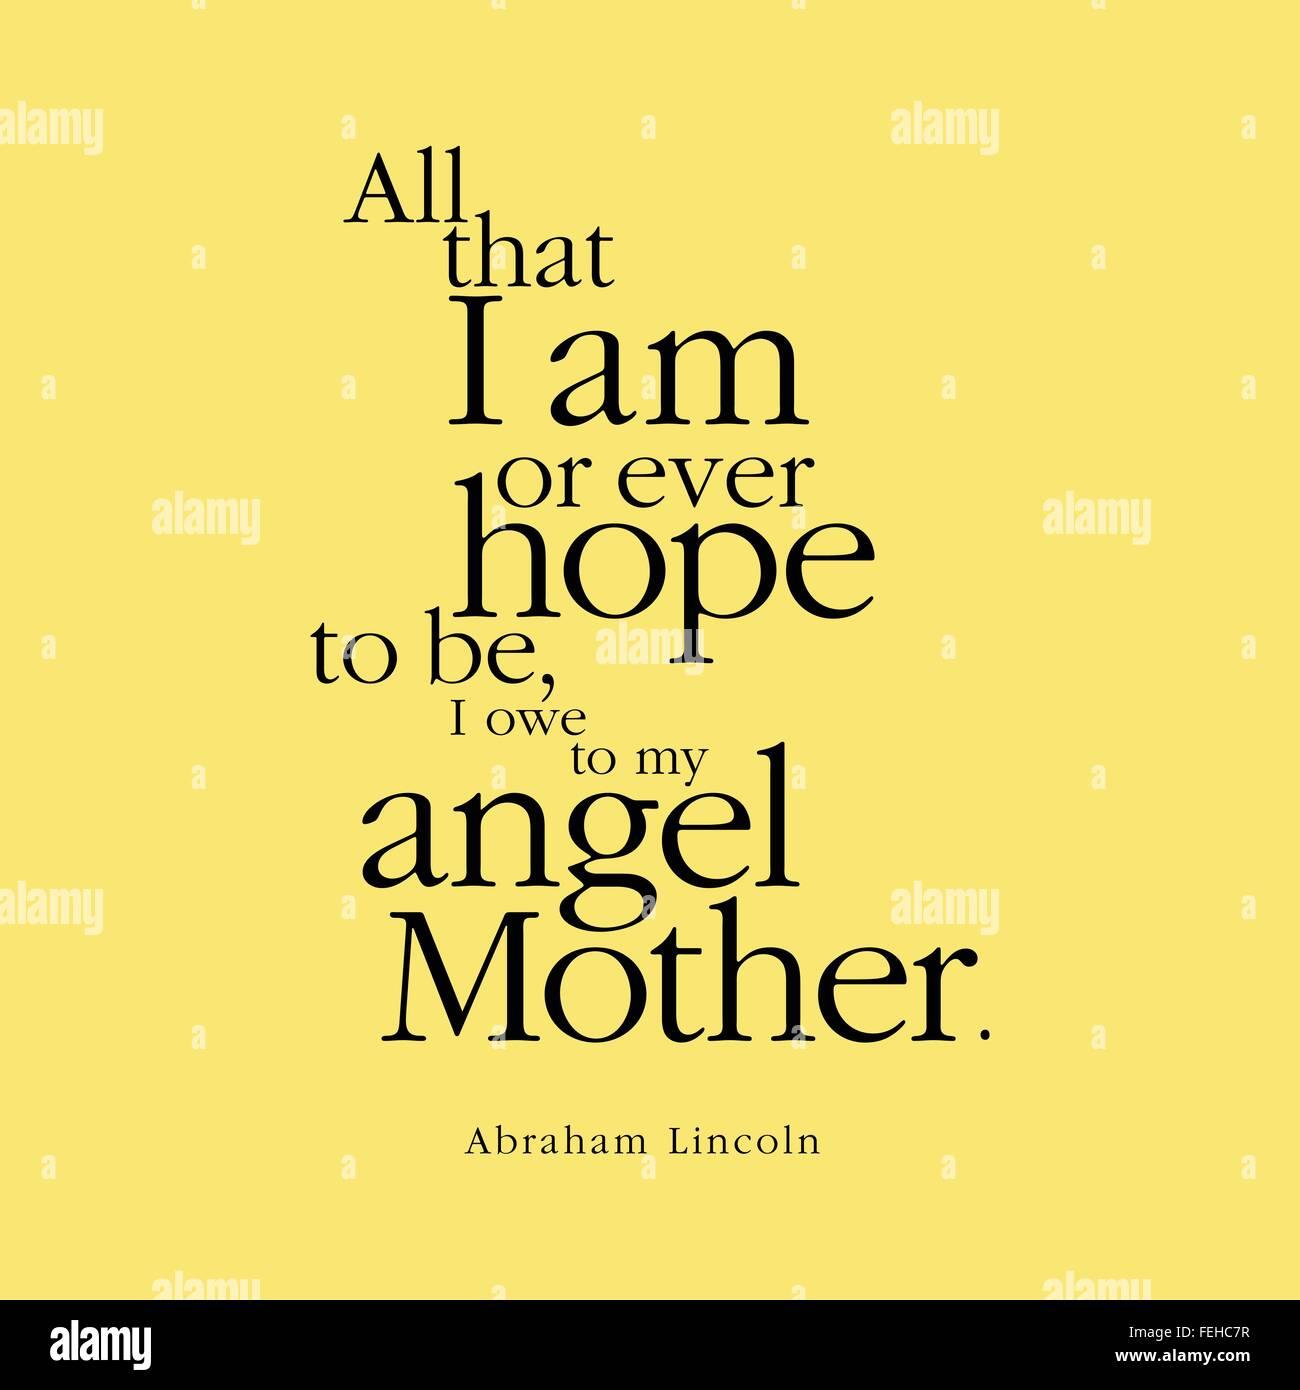 All That I Am Or Ever Hope To Be I Owe To My Angel Mother Abraham